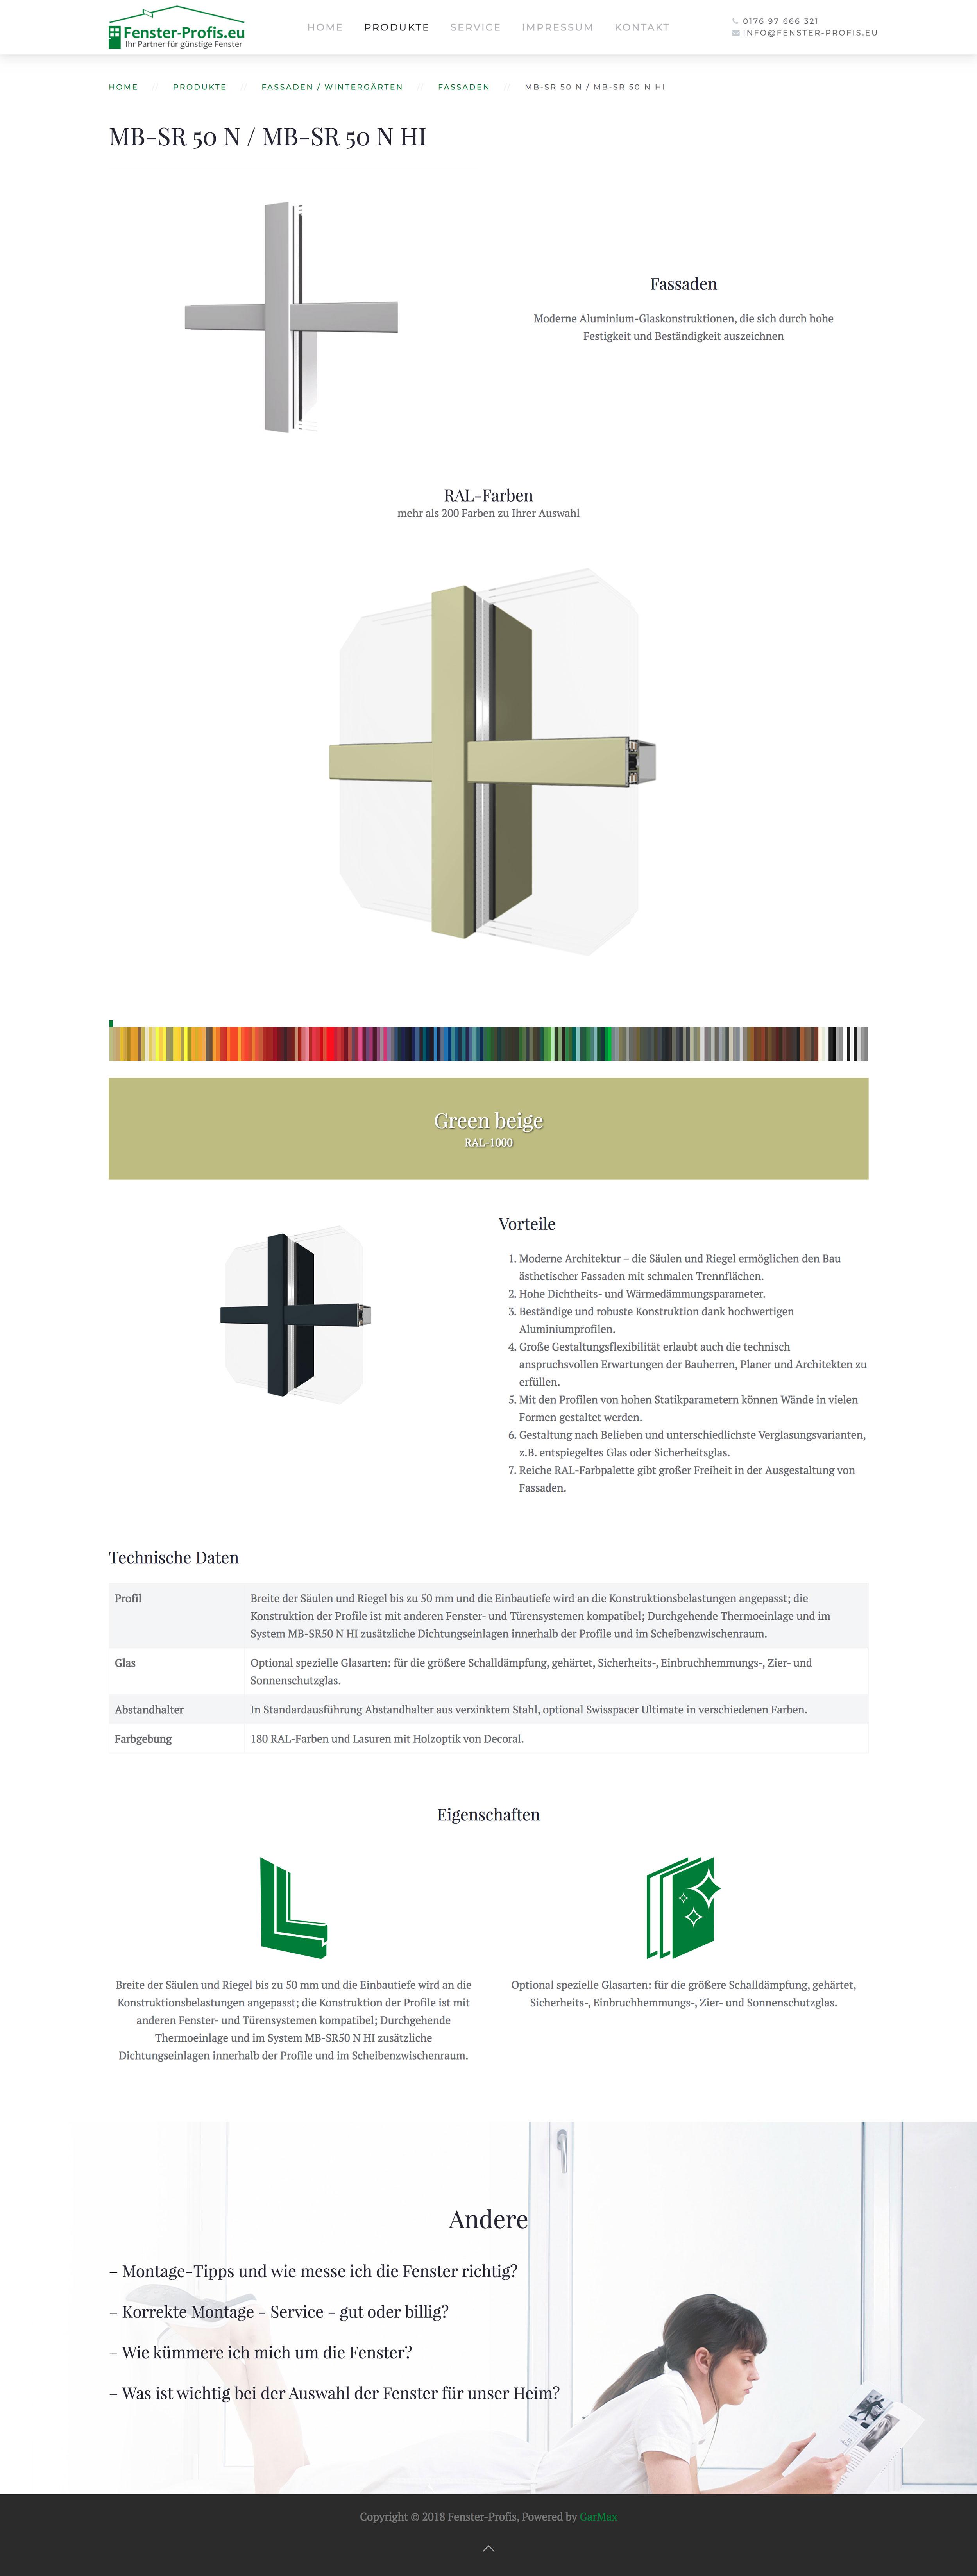 Fenster-Profis - Produkt 4